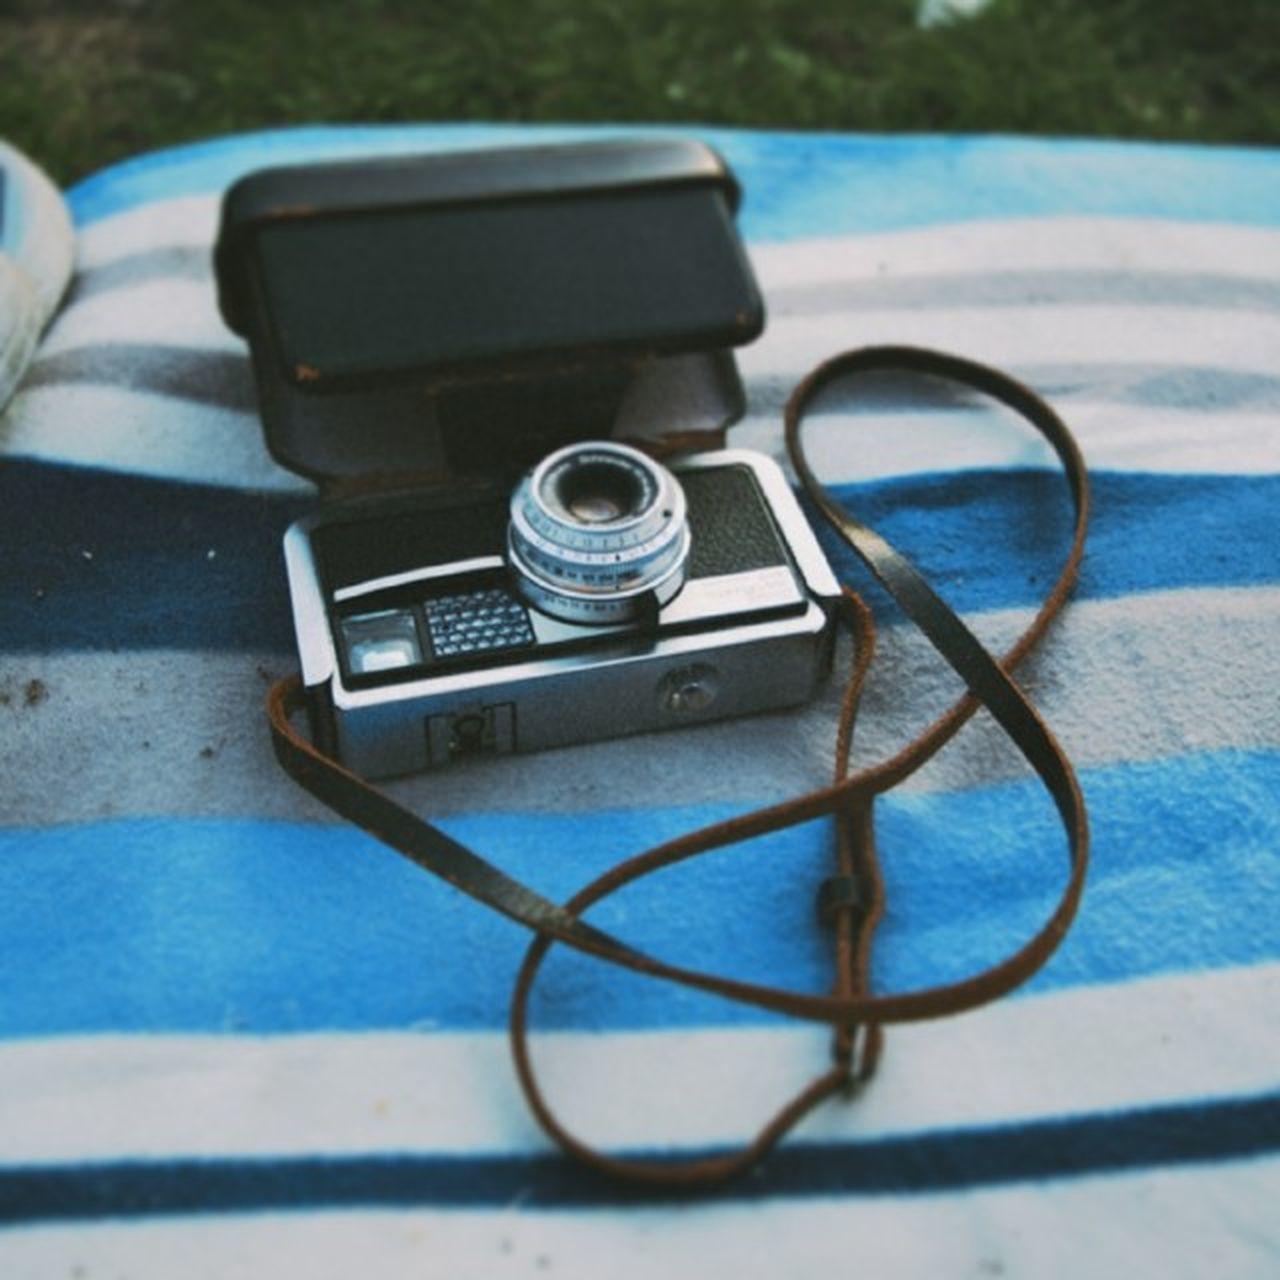 Close-up of instamatic camera